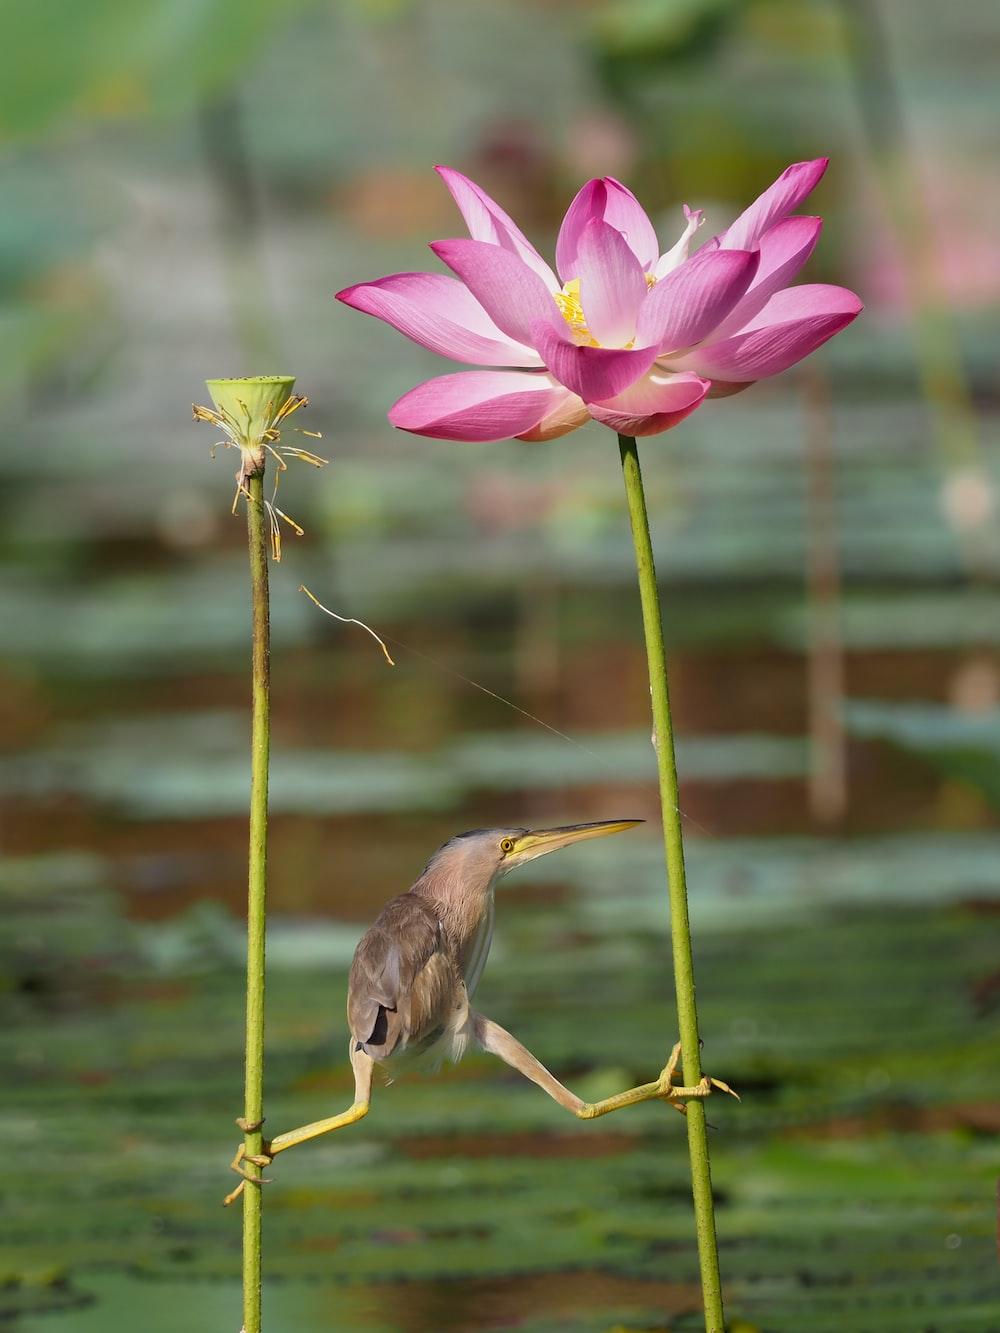 photo of bird holding his leg on pink petaled flower